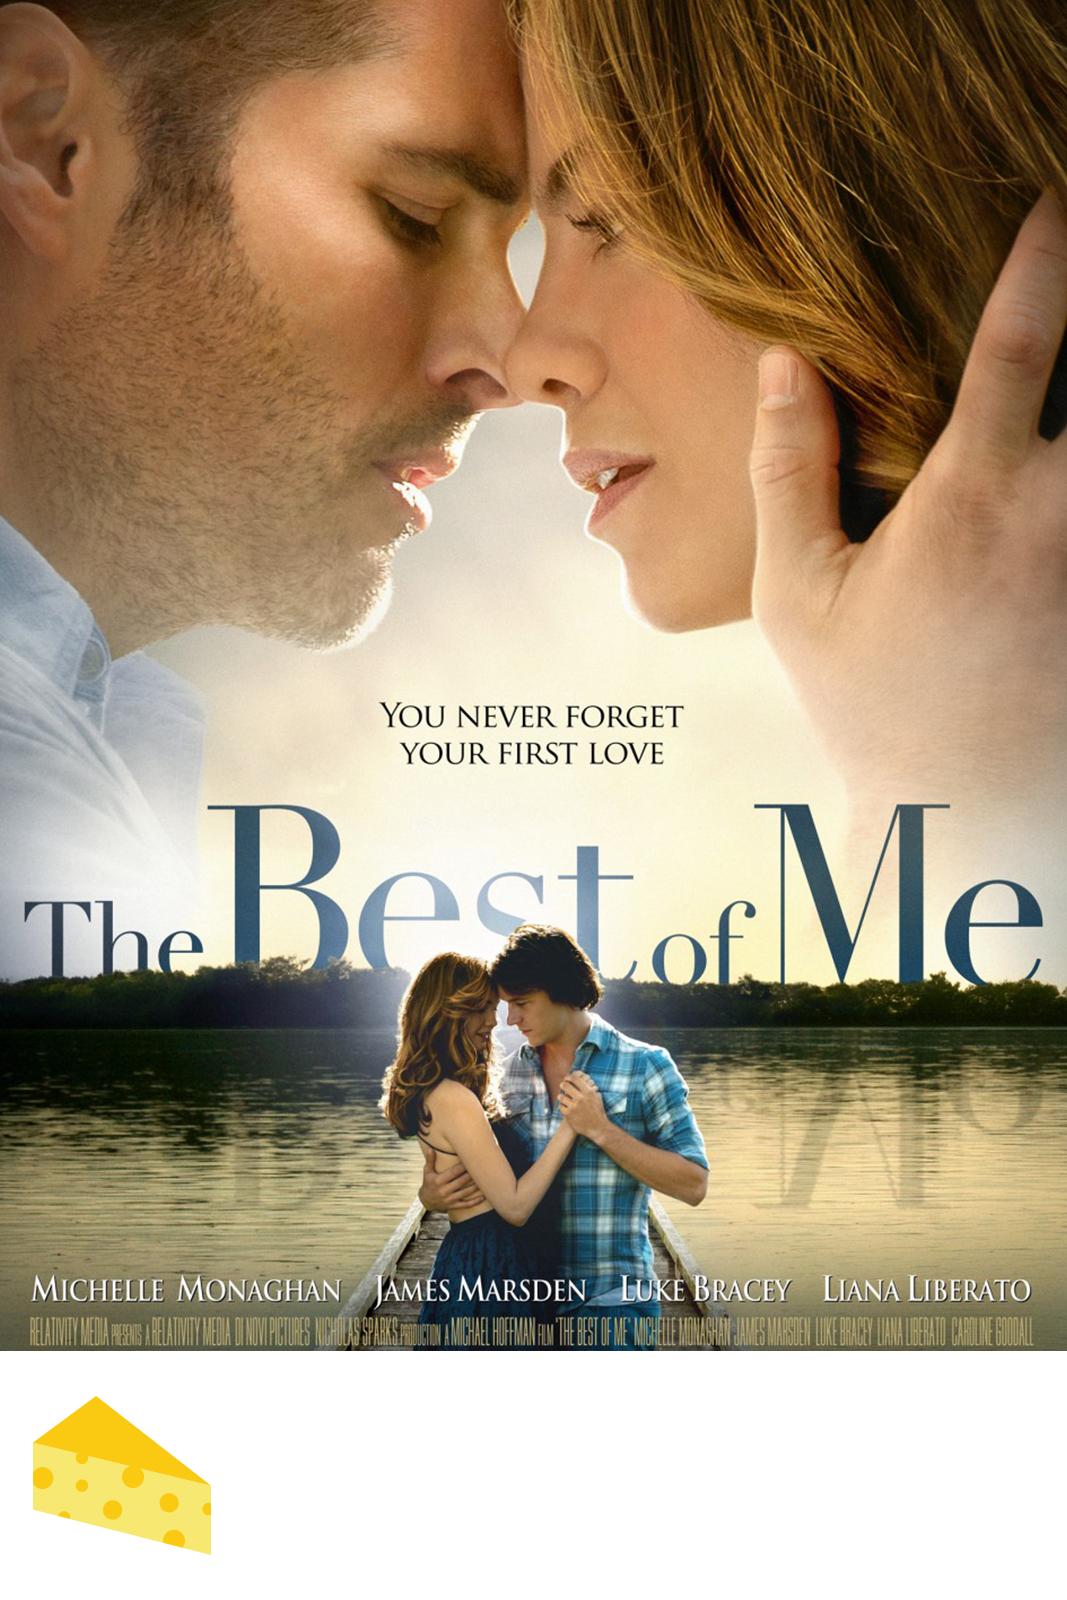 Nicholas Sparks Movies To Watch And Skip, Romance Films